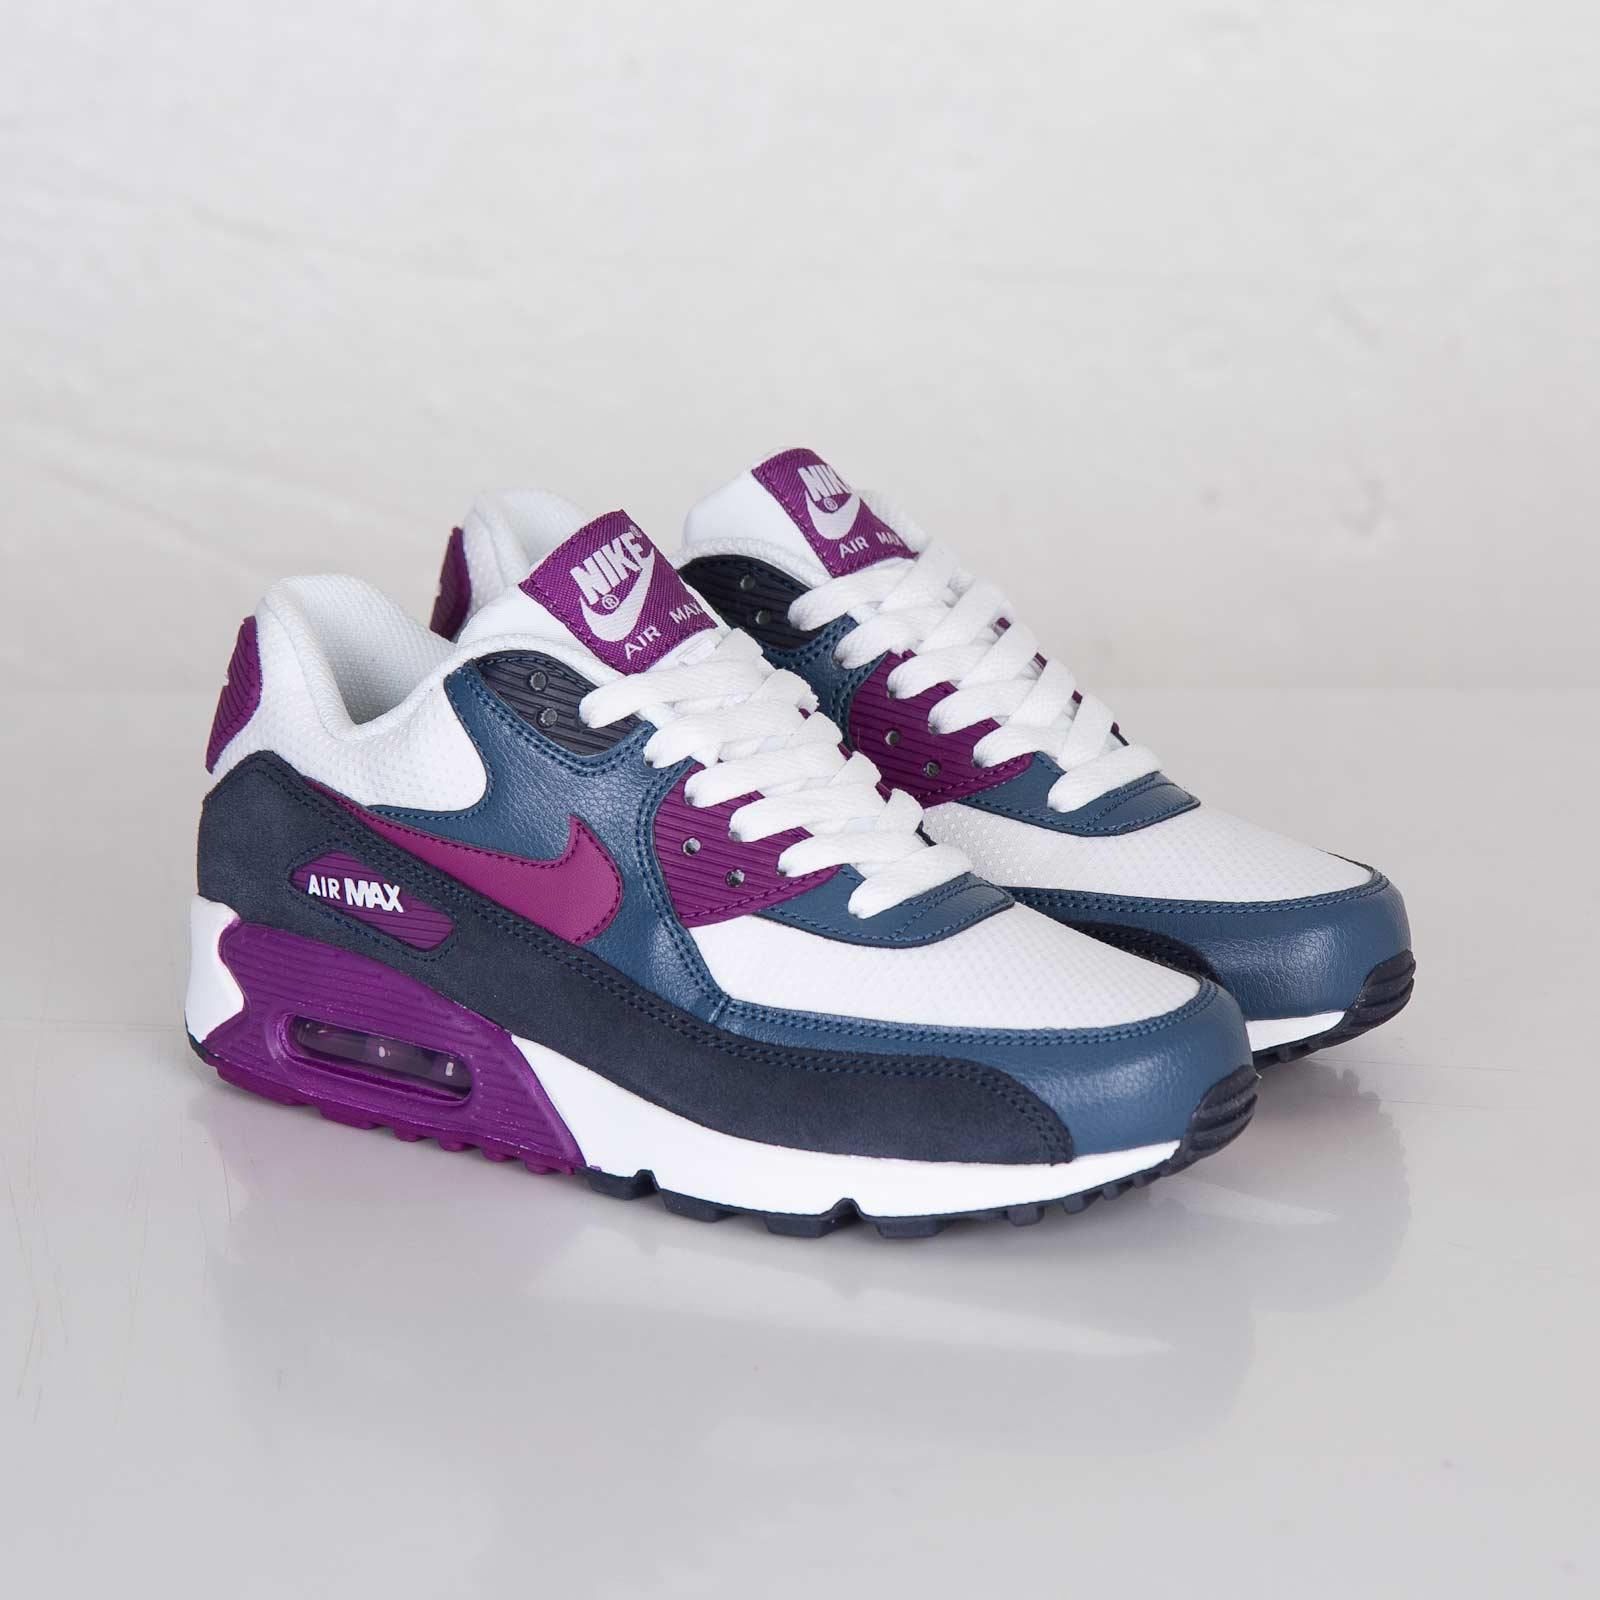 Nike Wmns Air Max 97 / Bright Grape 2tjmxMQ